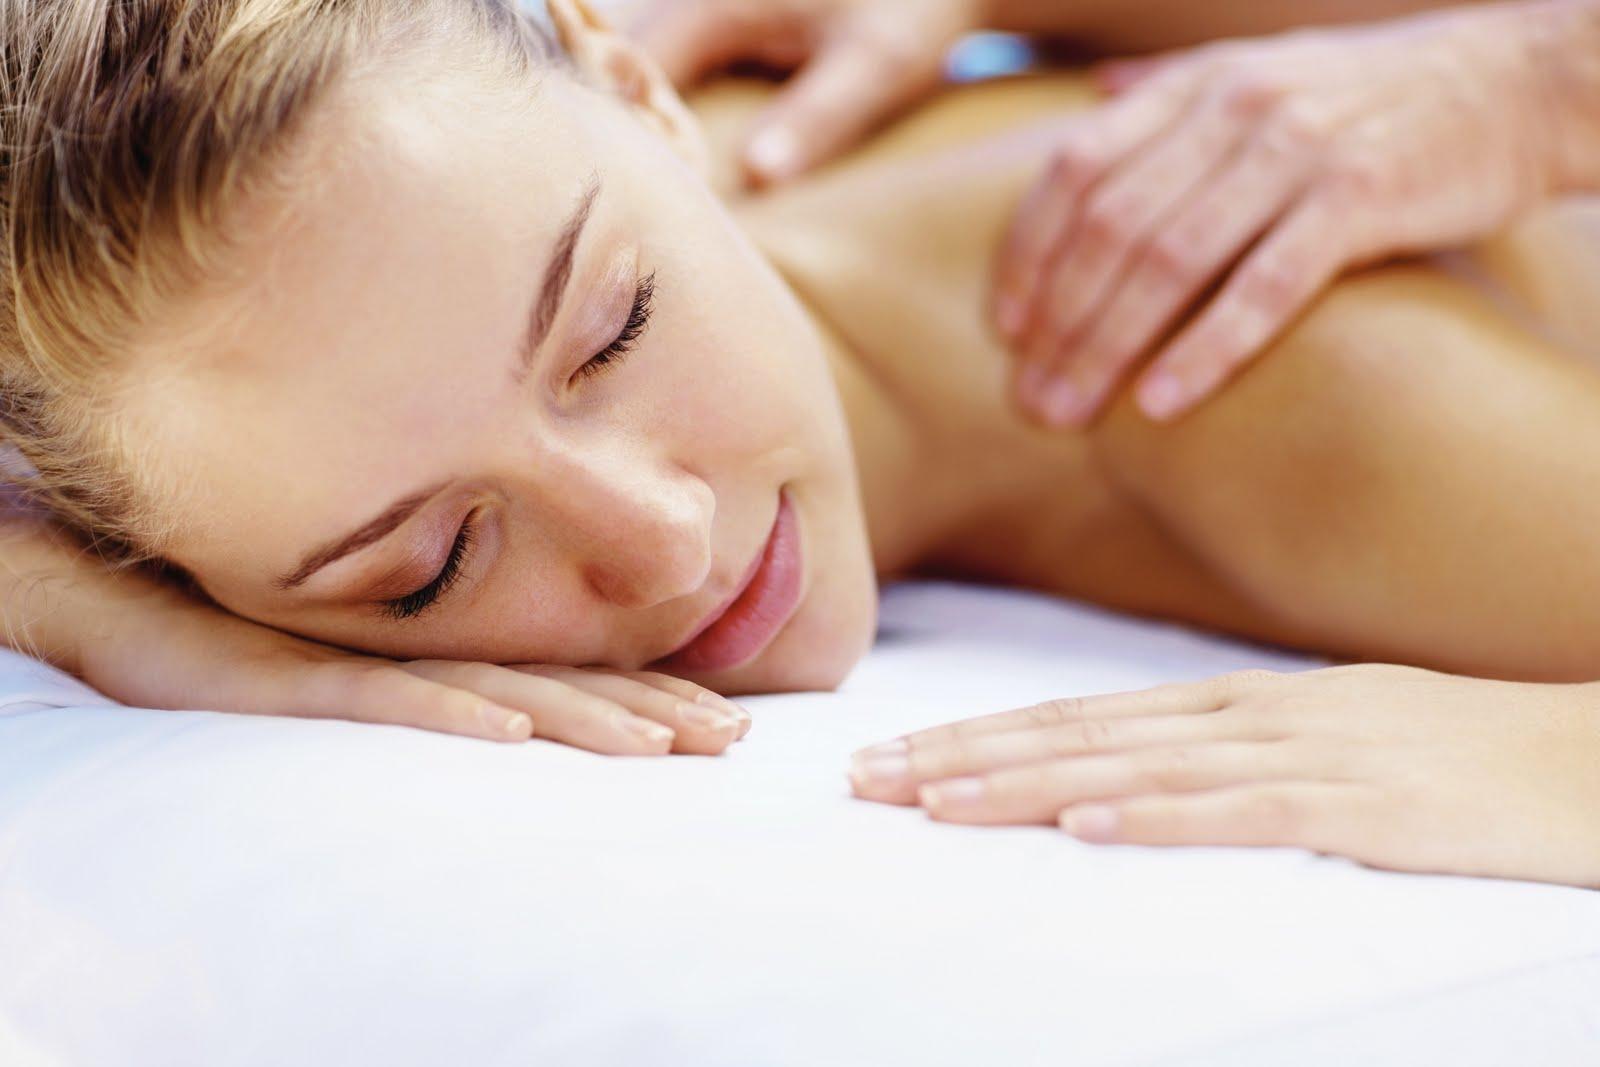 2.Relaxation Massage